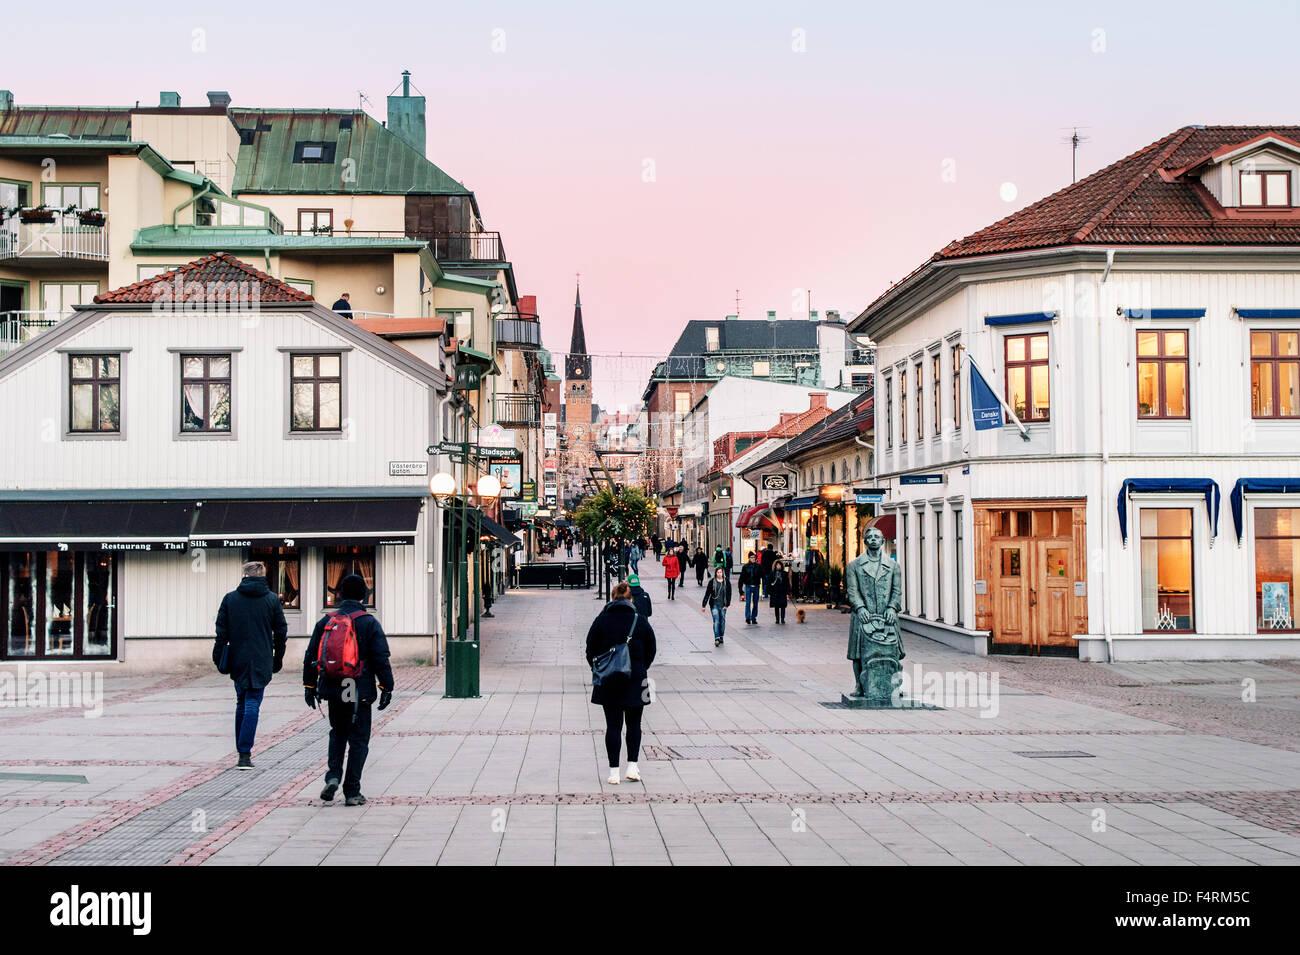 Sweden Vastra Gotaland Boras Street Scene With Sculpture In Stock Photo Alamy